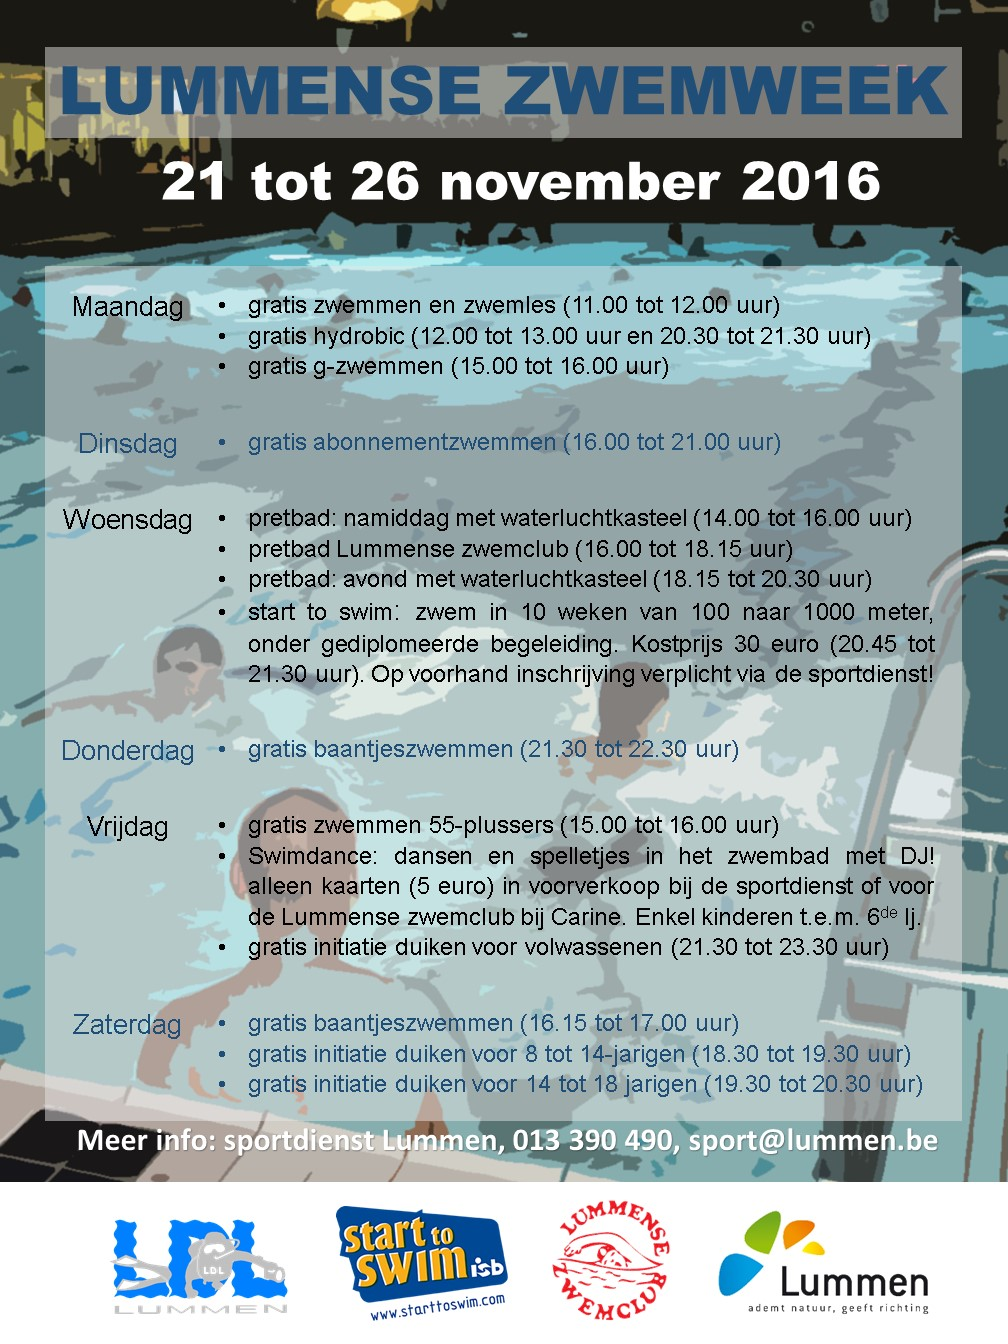 Affiche-lummense-zwemweek-2016